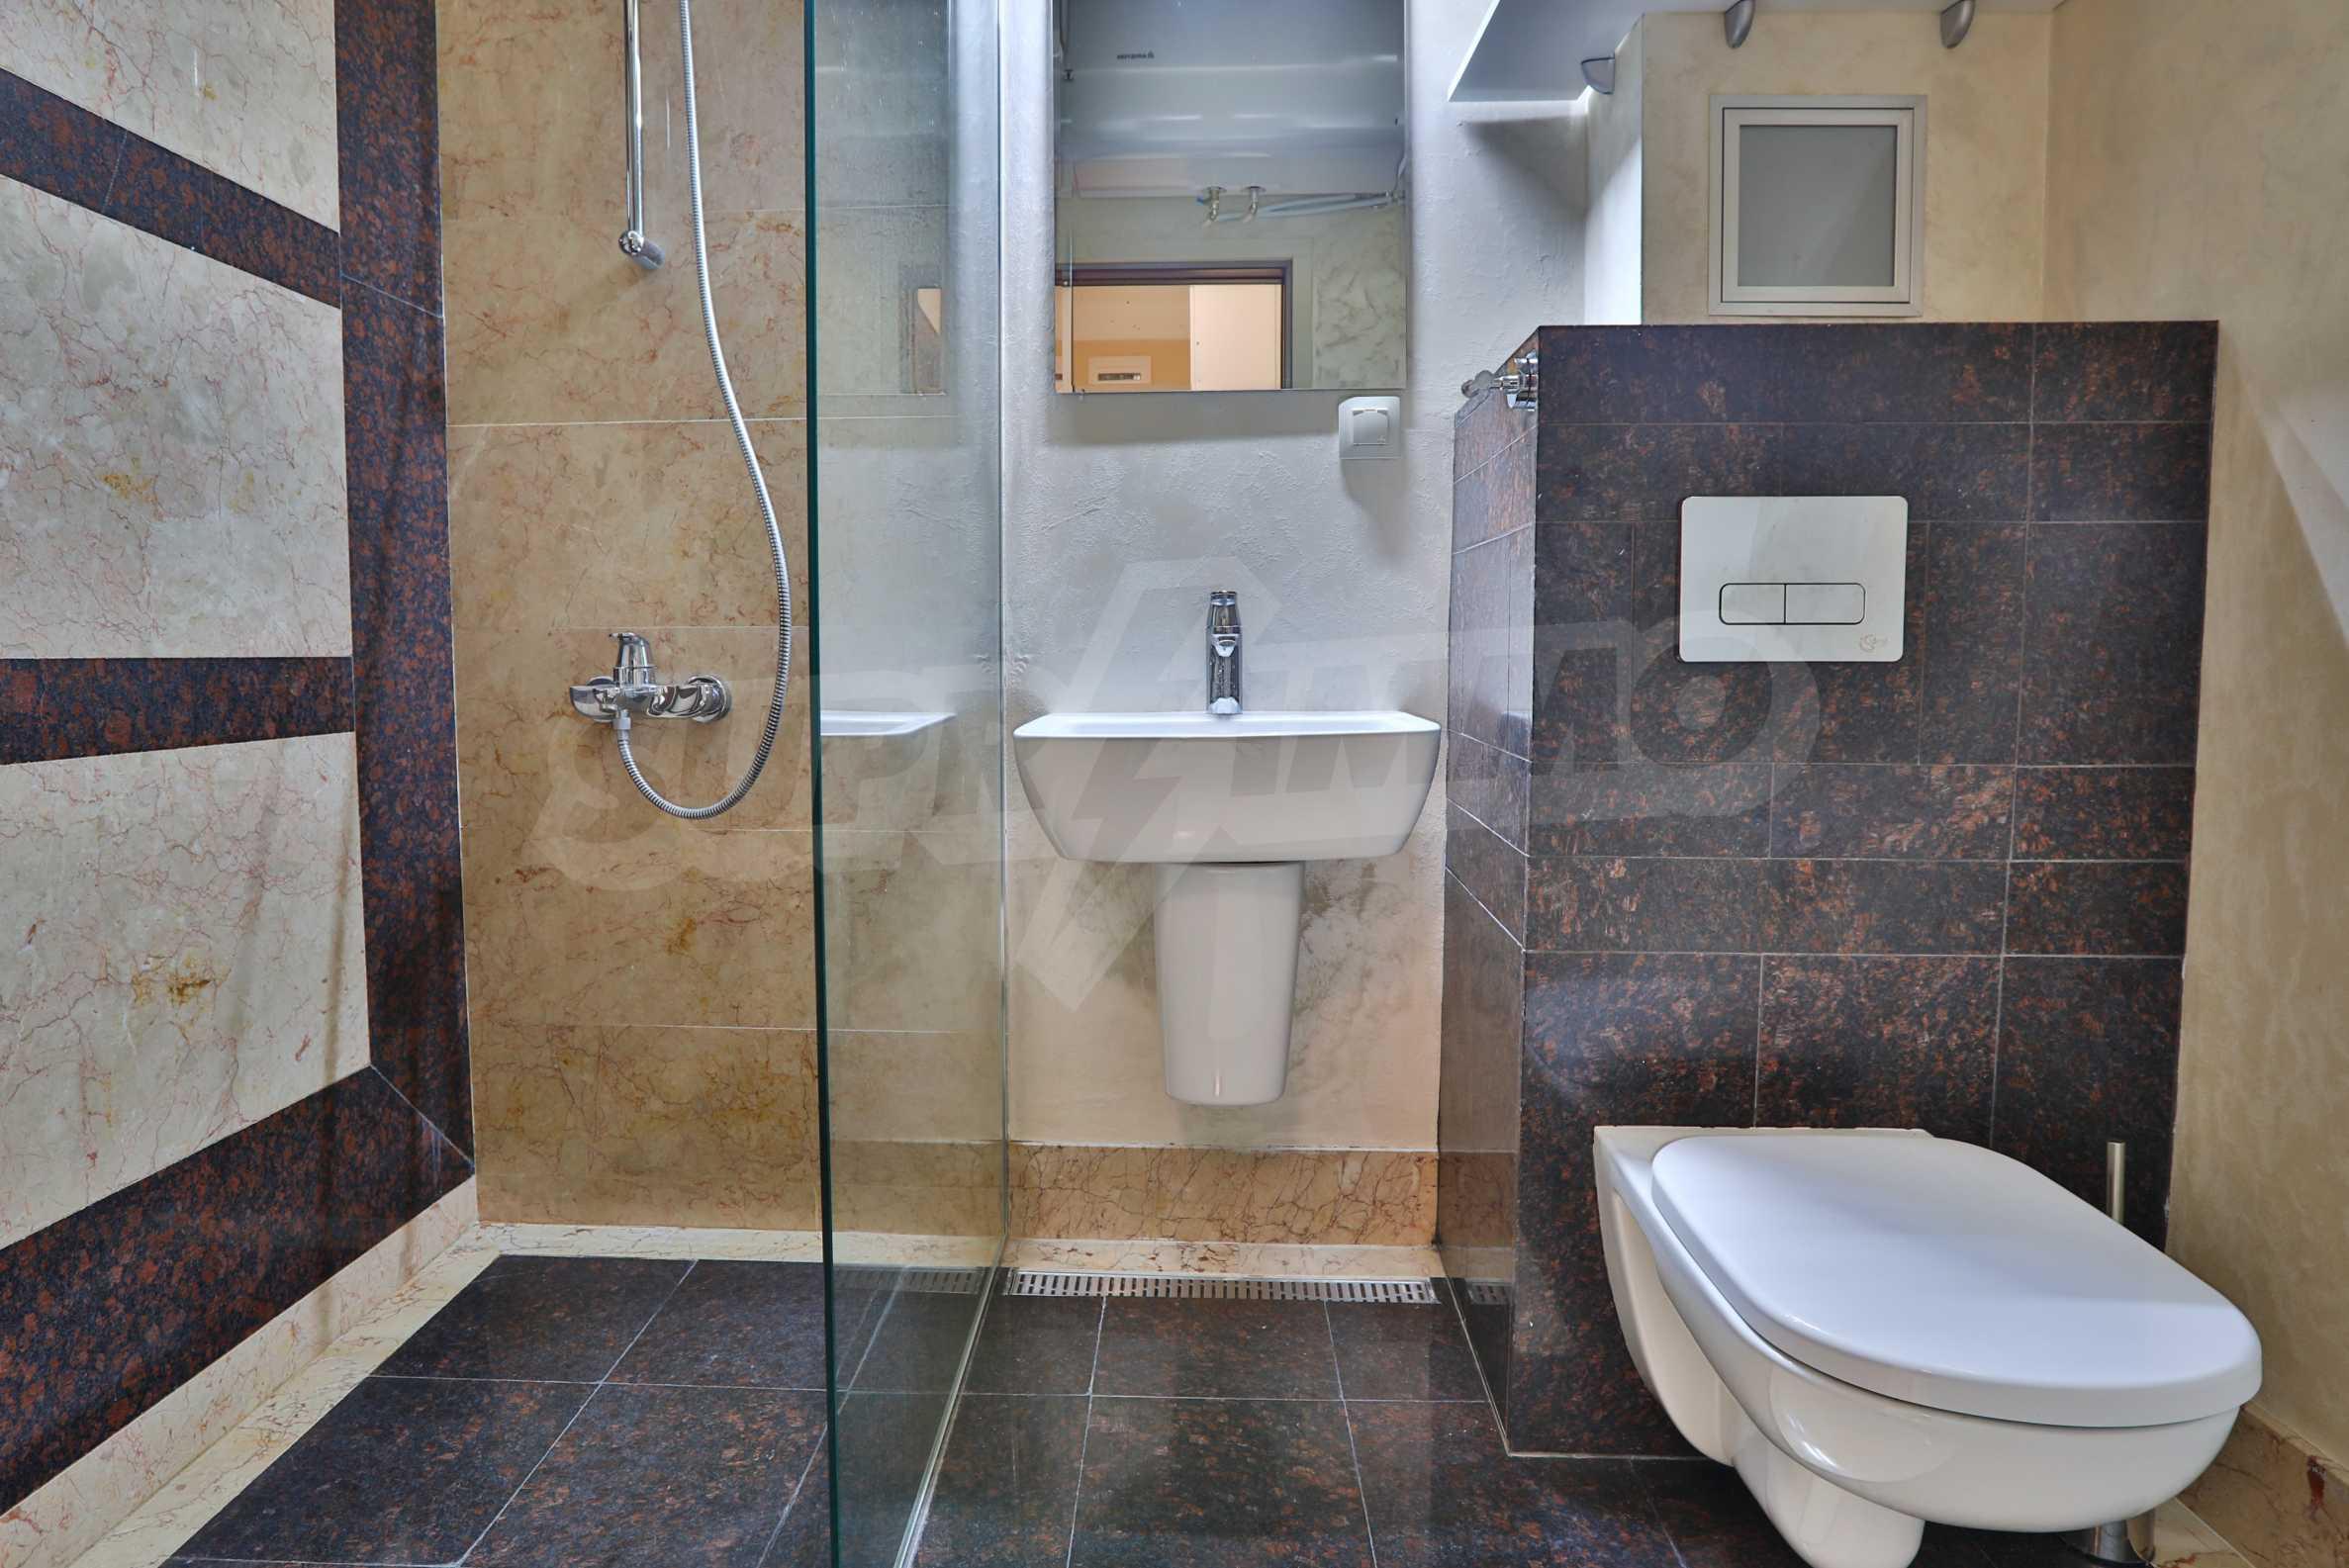 Exclusive 2-bedroom beachfront apartment in the prestigious Belle Époque Beach Residence 23